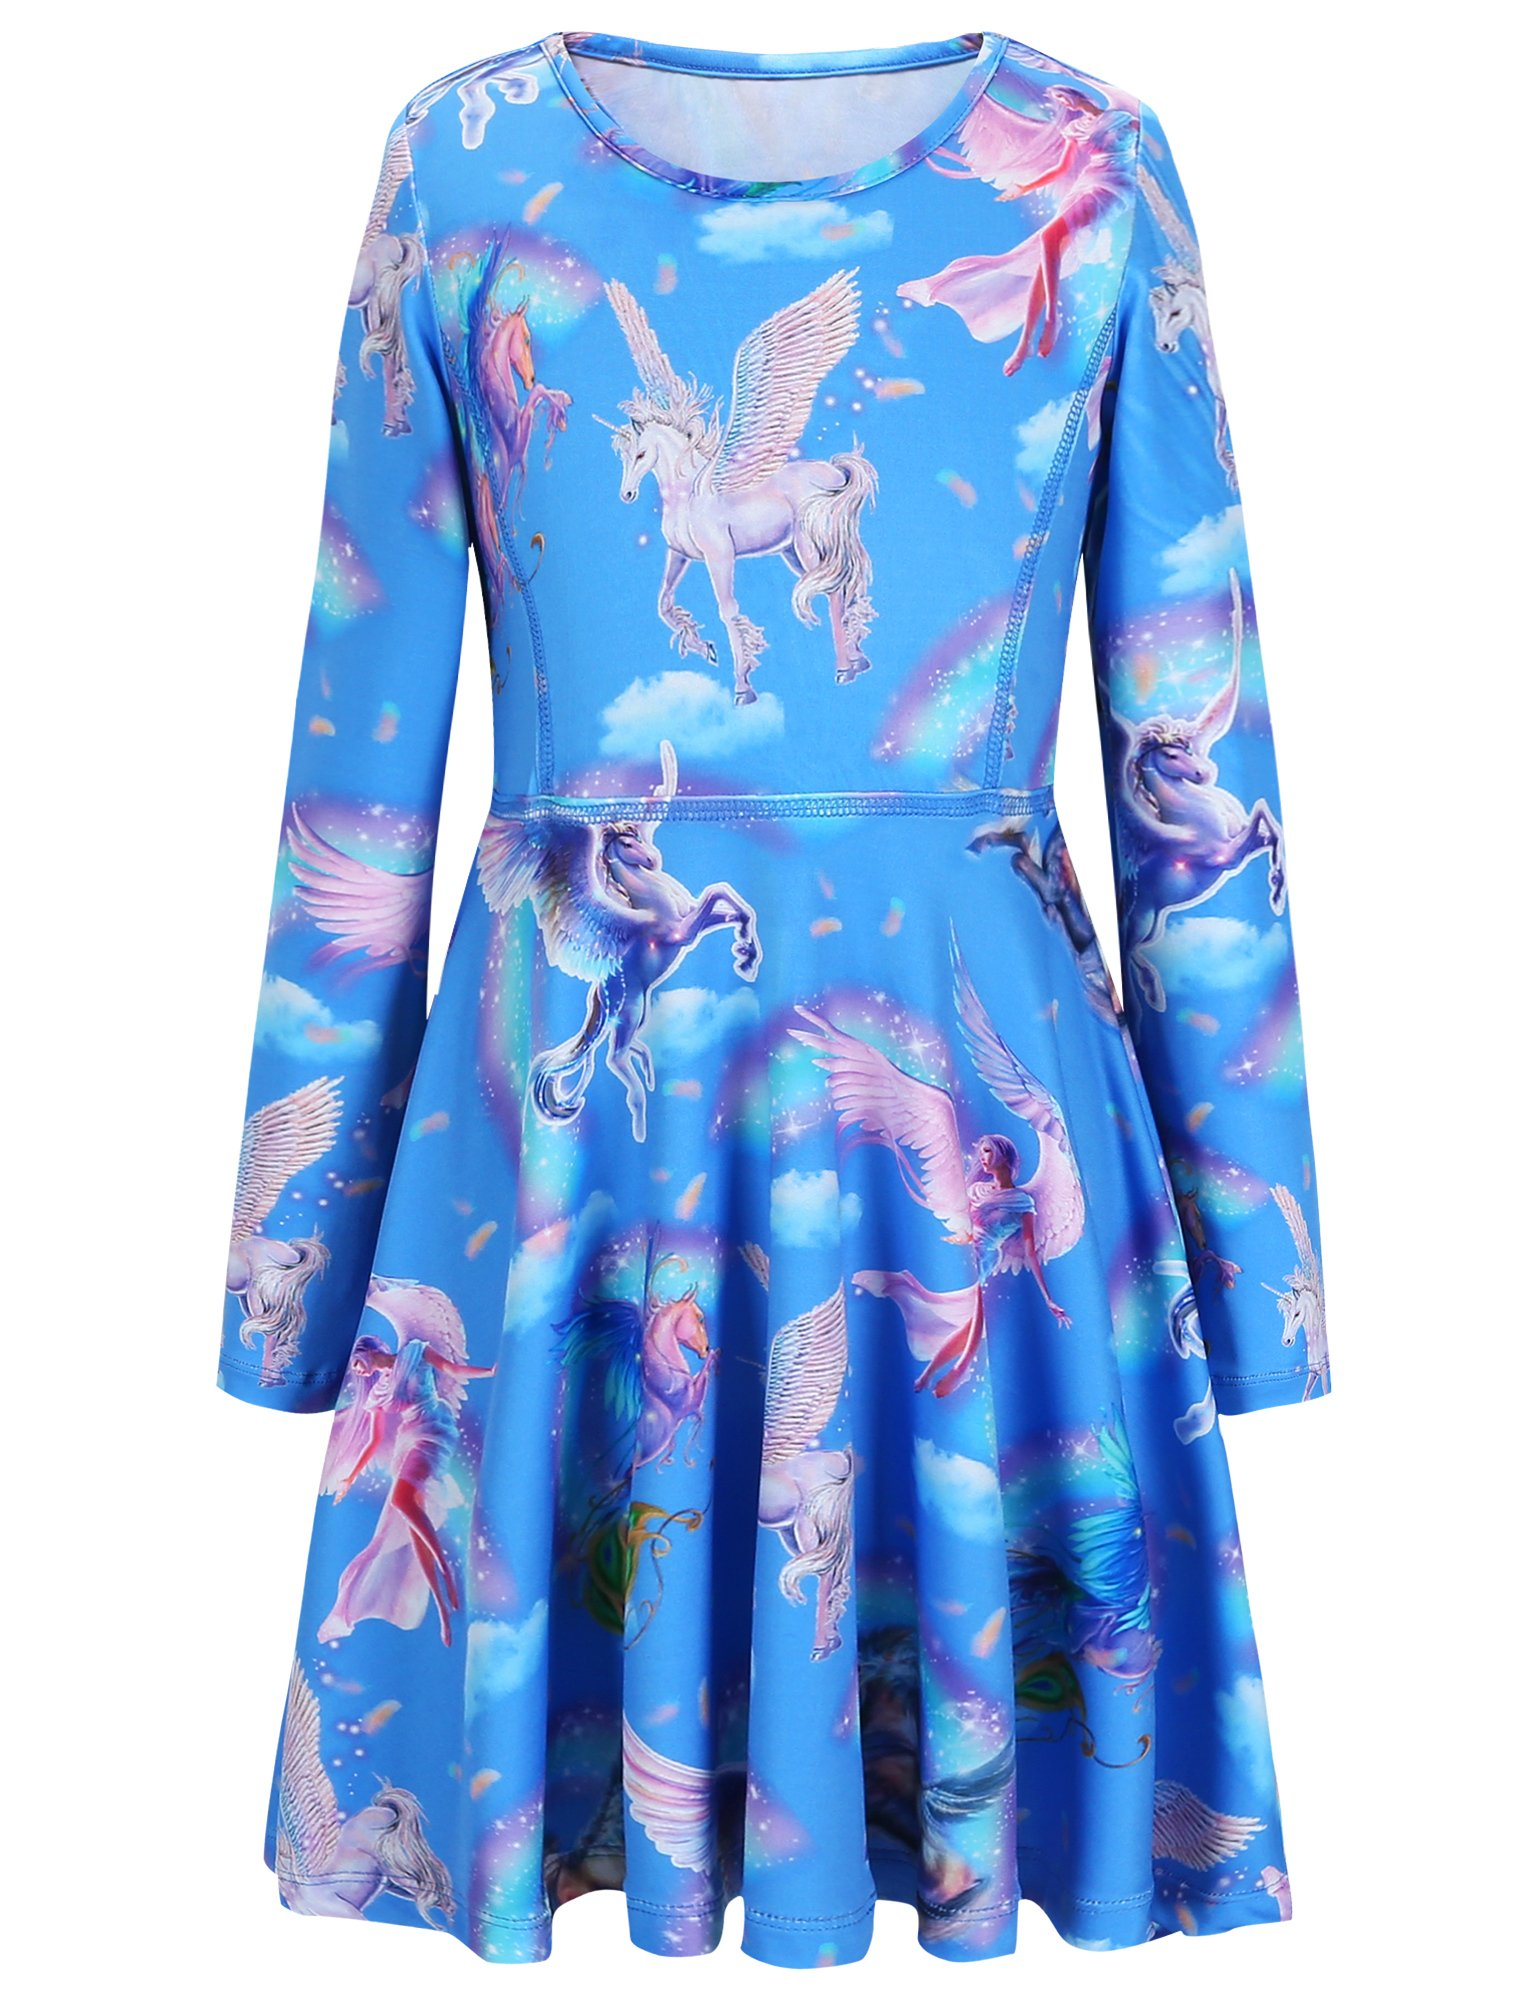 Jxstar Girls Dress Sky Unicorn Print Dress Long Sleeve Tshirt Dress Sky Unicorn 130